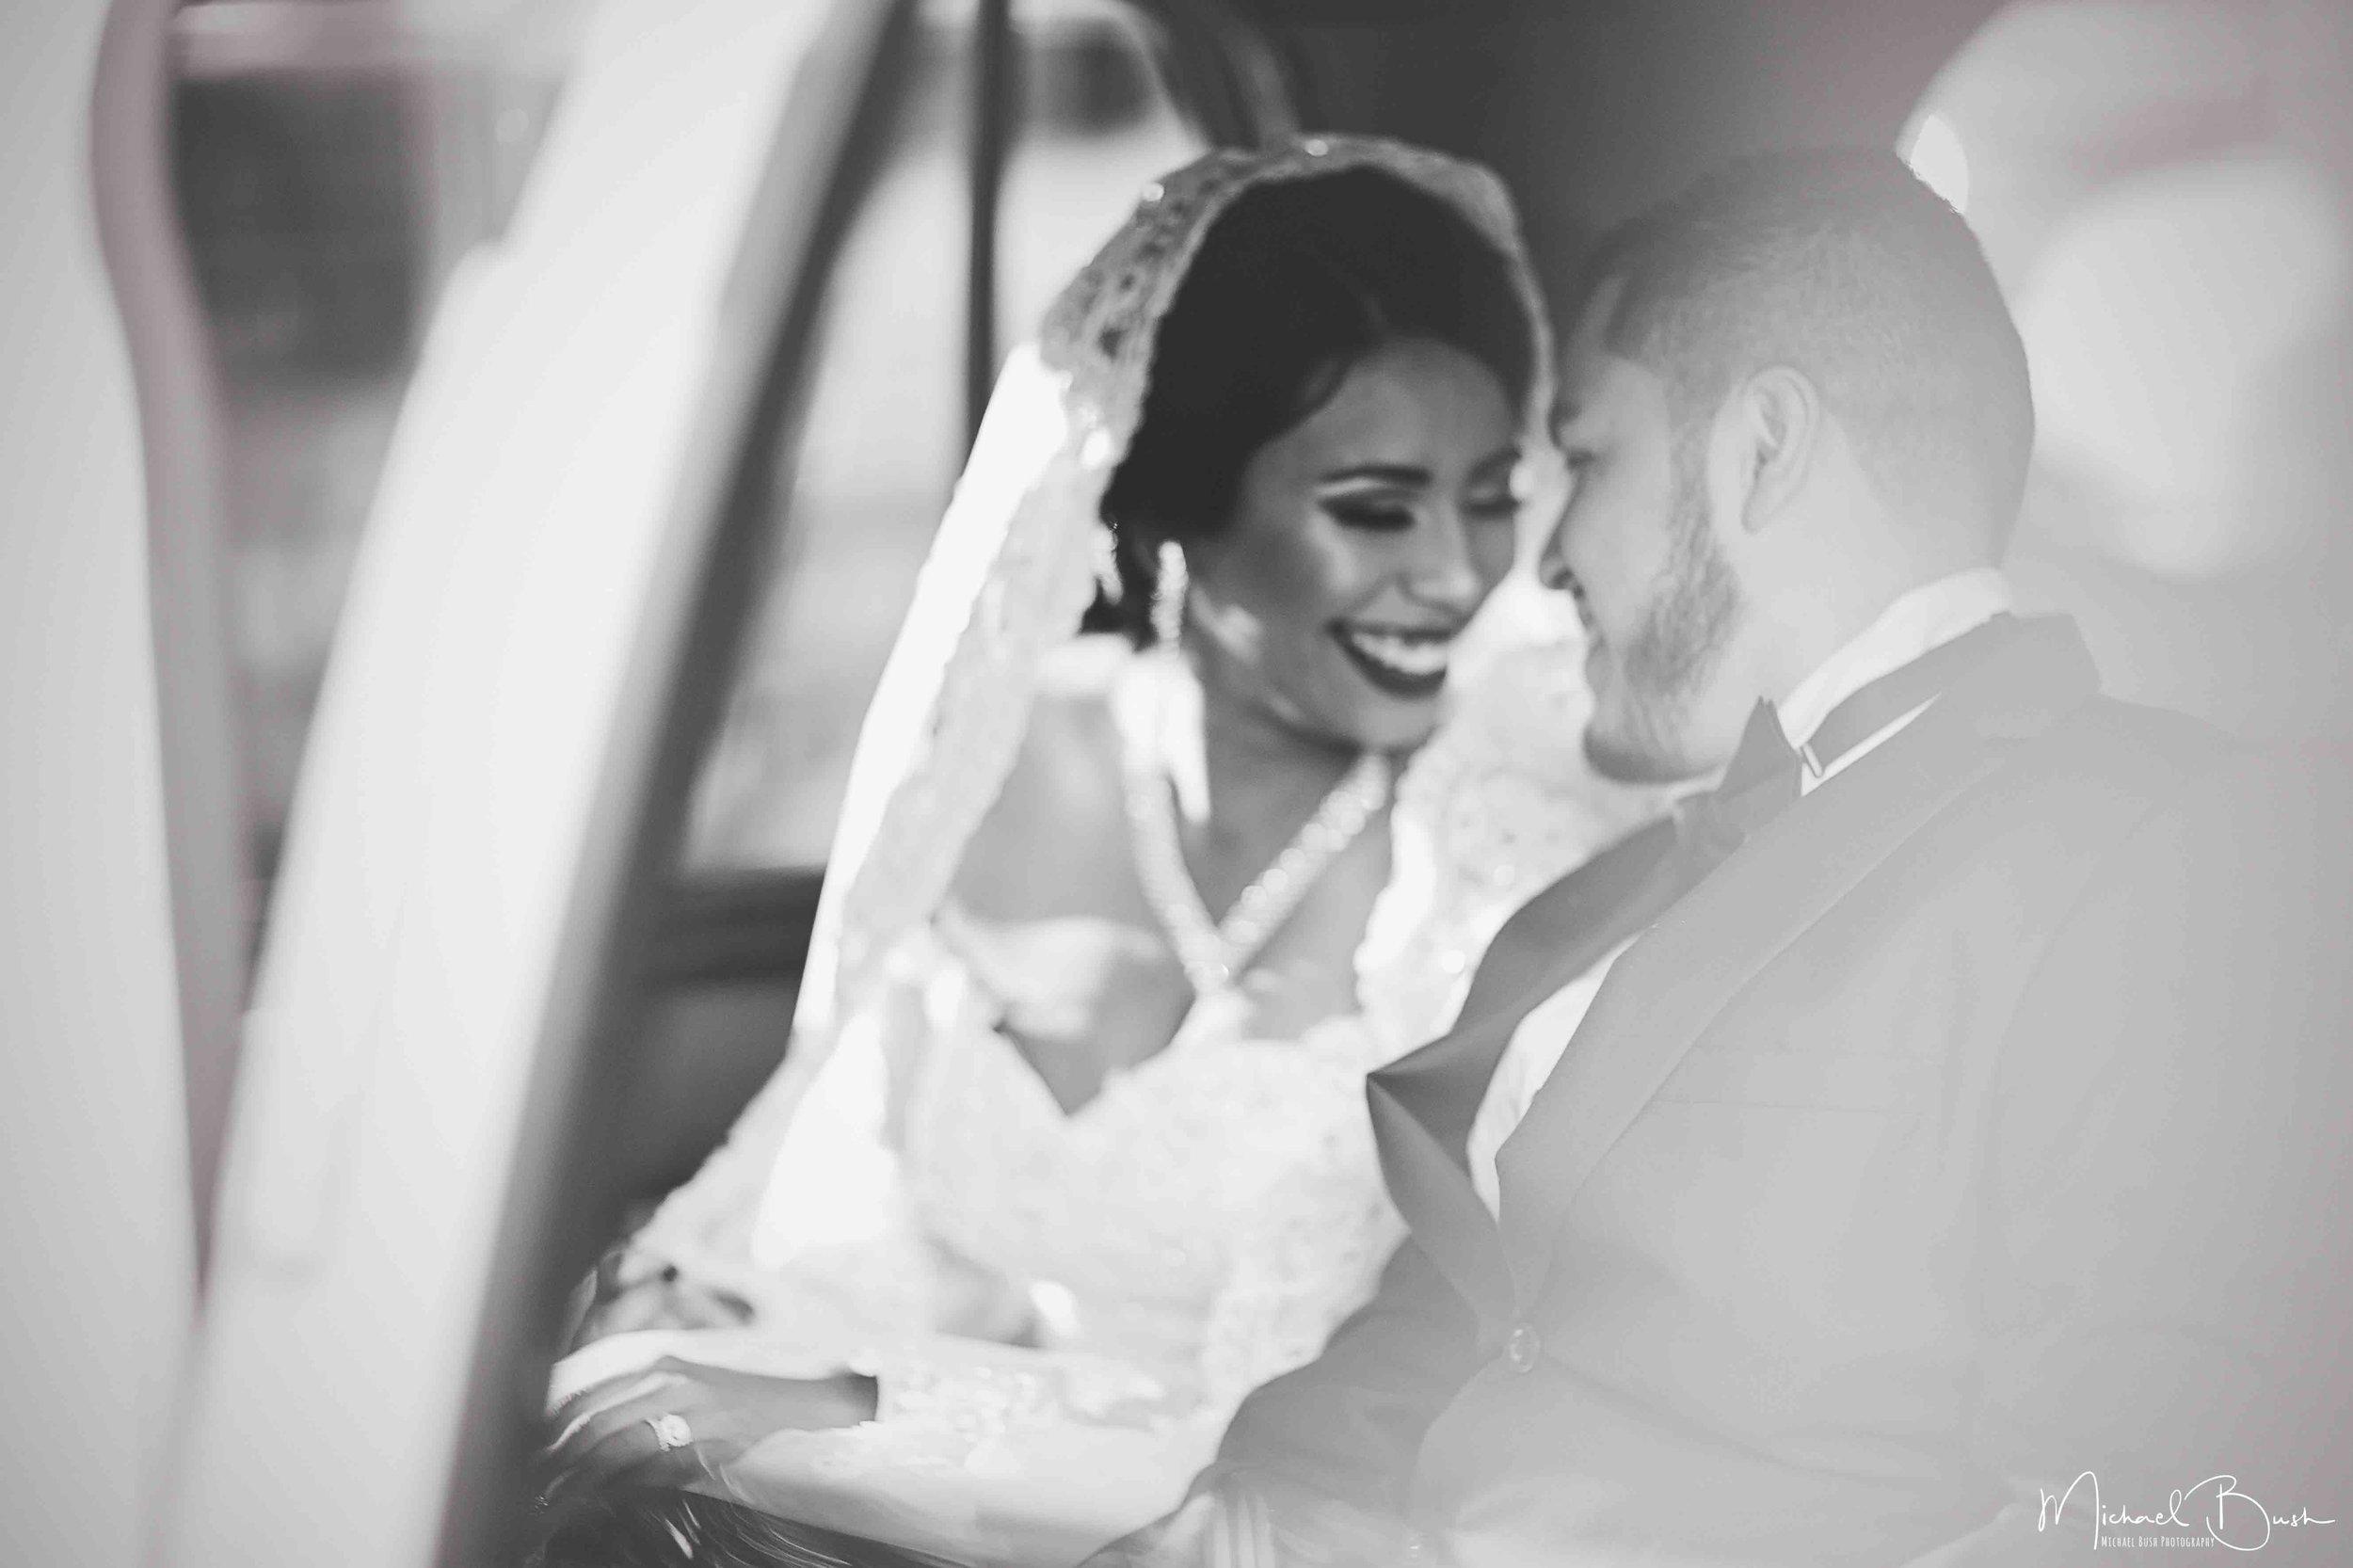 Wedding-Details-Bride-Fort Worth-colors-Ceremony-weddingceremony-brides-groom-ido-church-fashion-bride&groom-emotions-happy.jpg